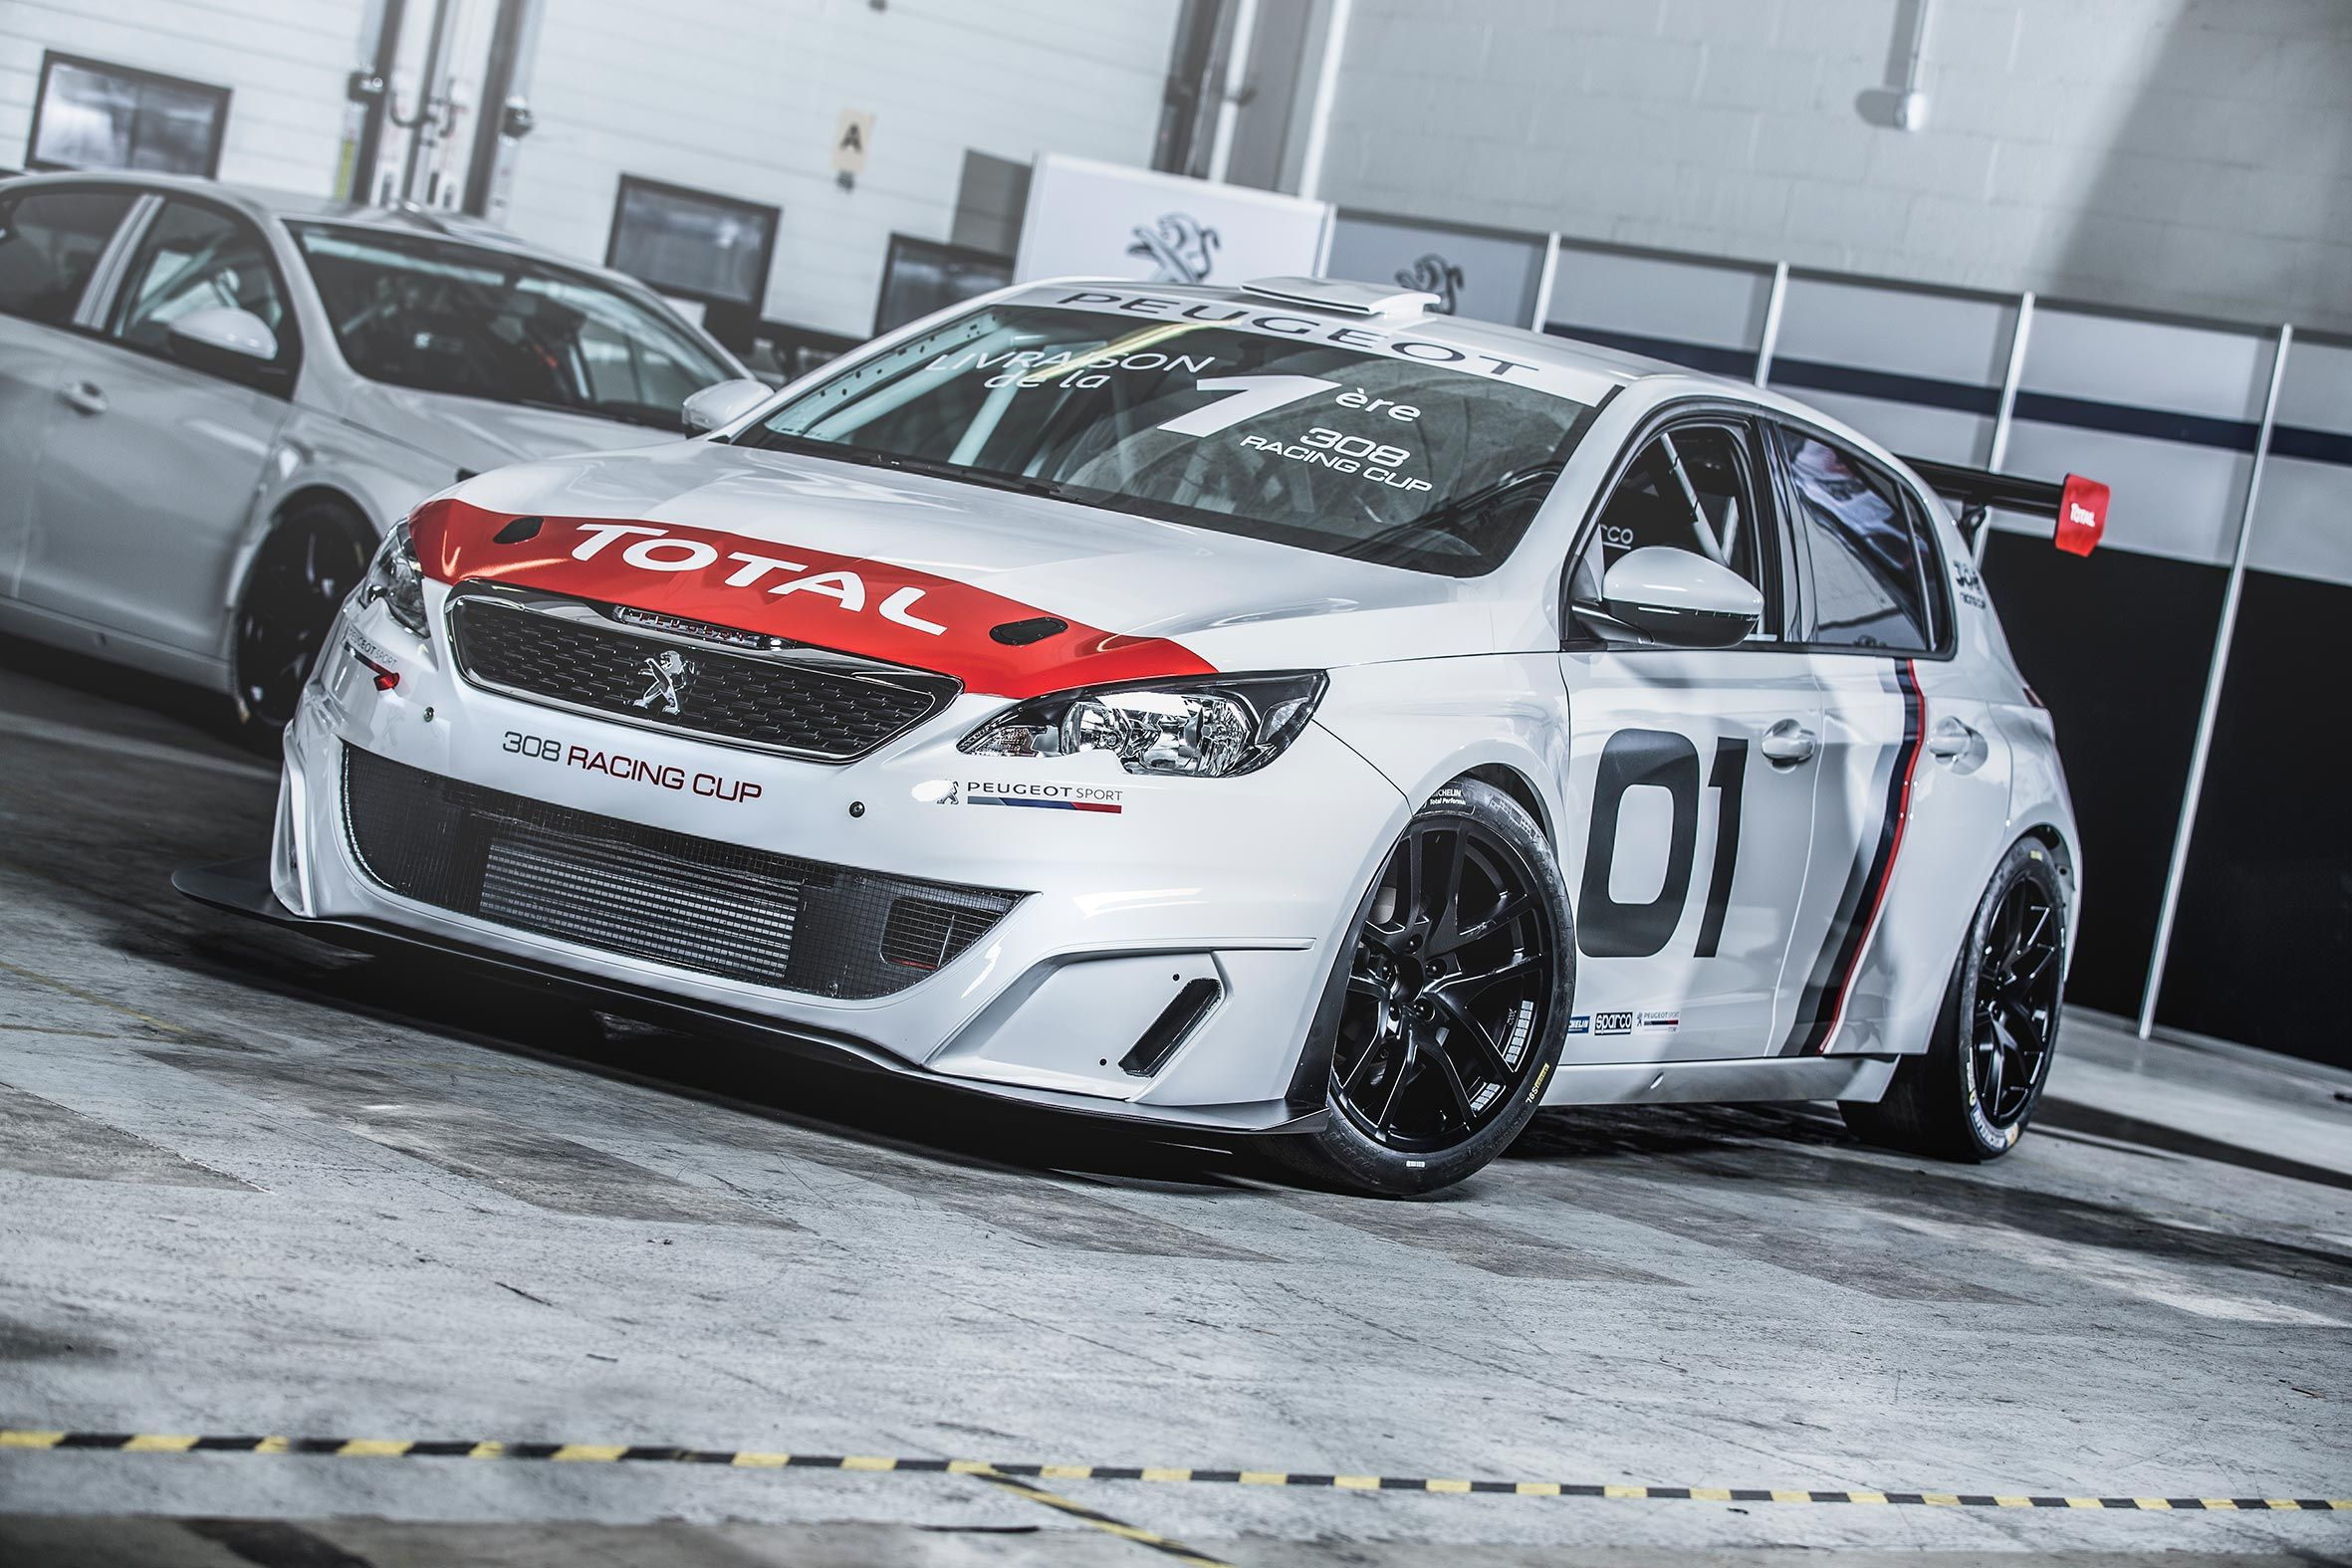 Entregado el primer Peugeot 308 Racing Cup